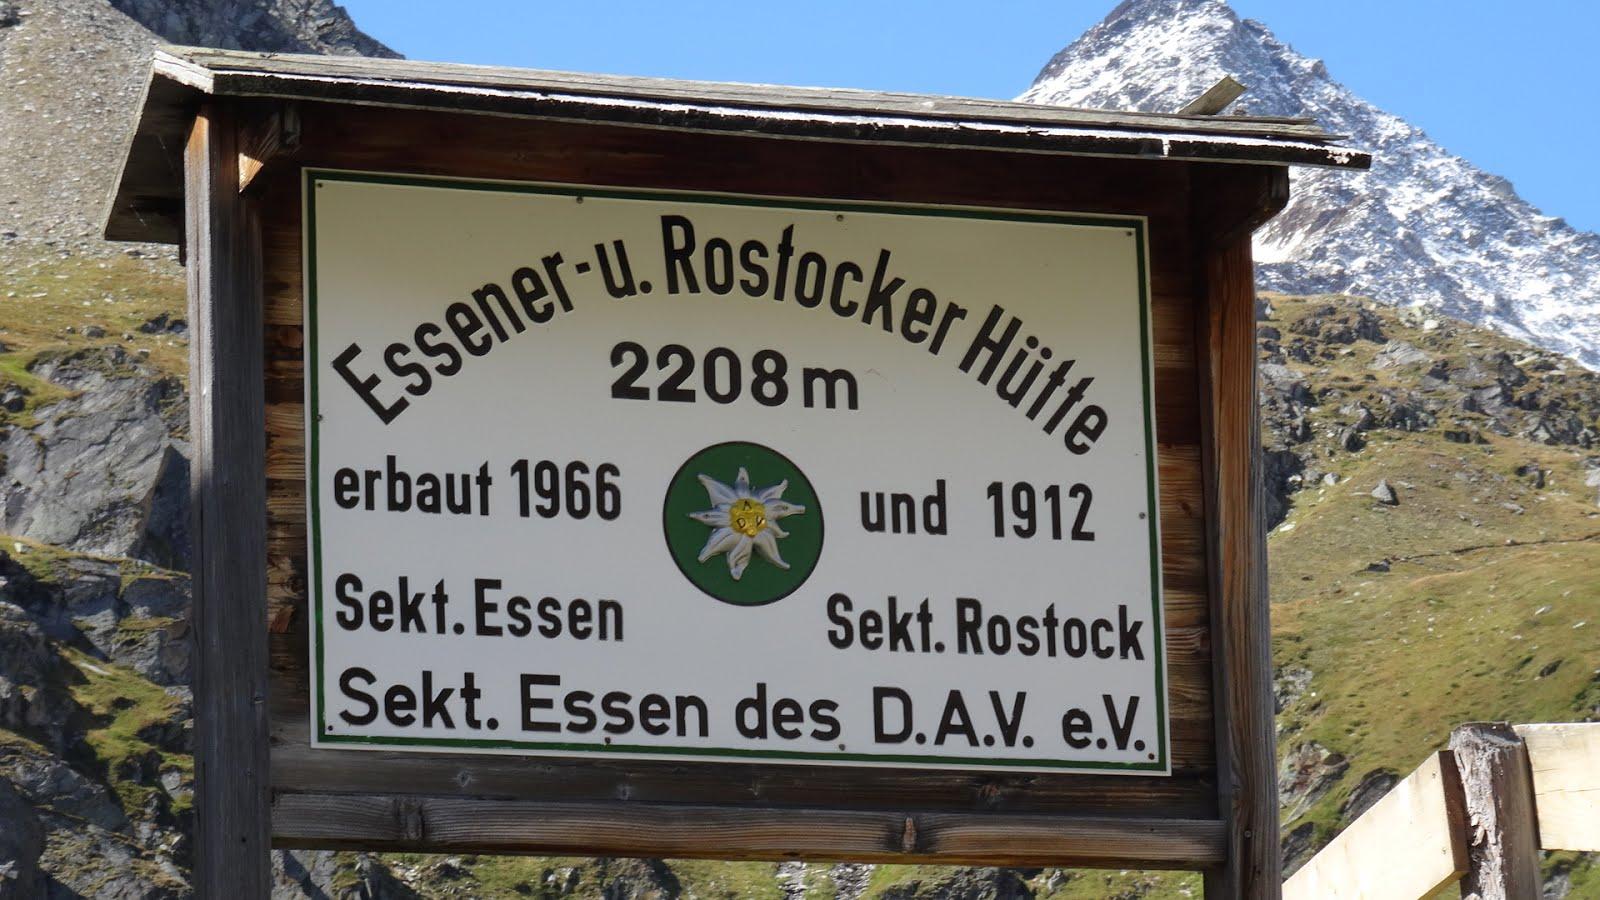 Essener-Rostocker hutte